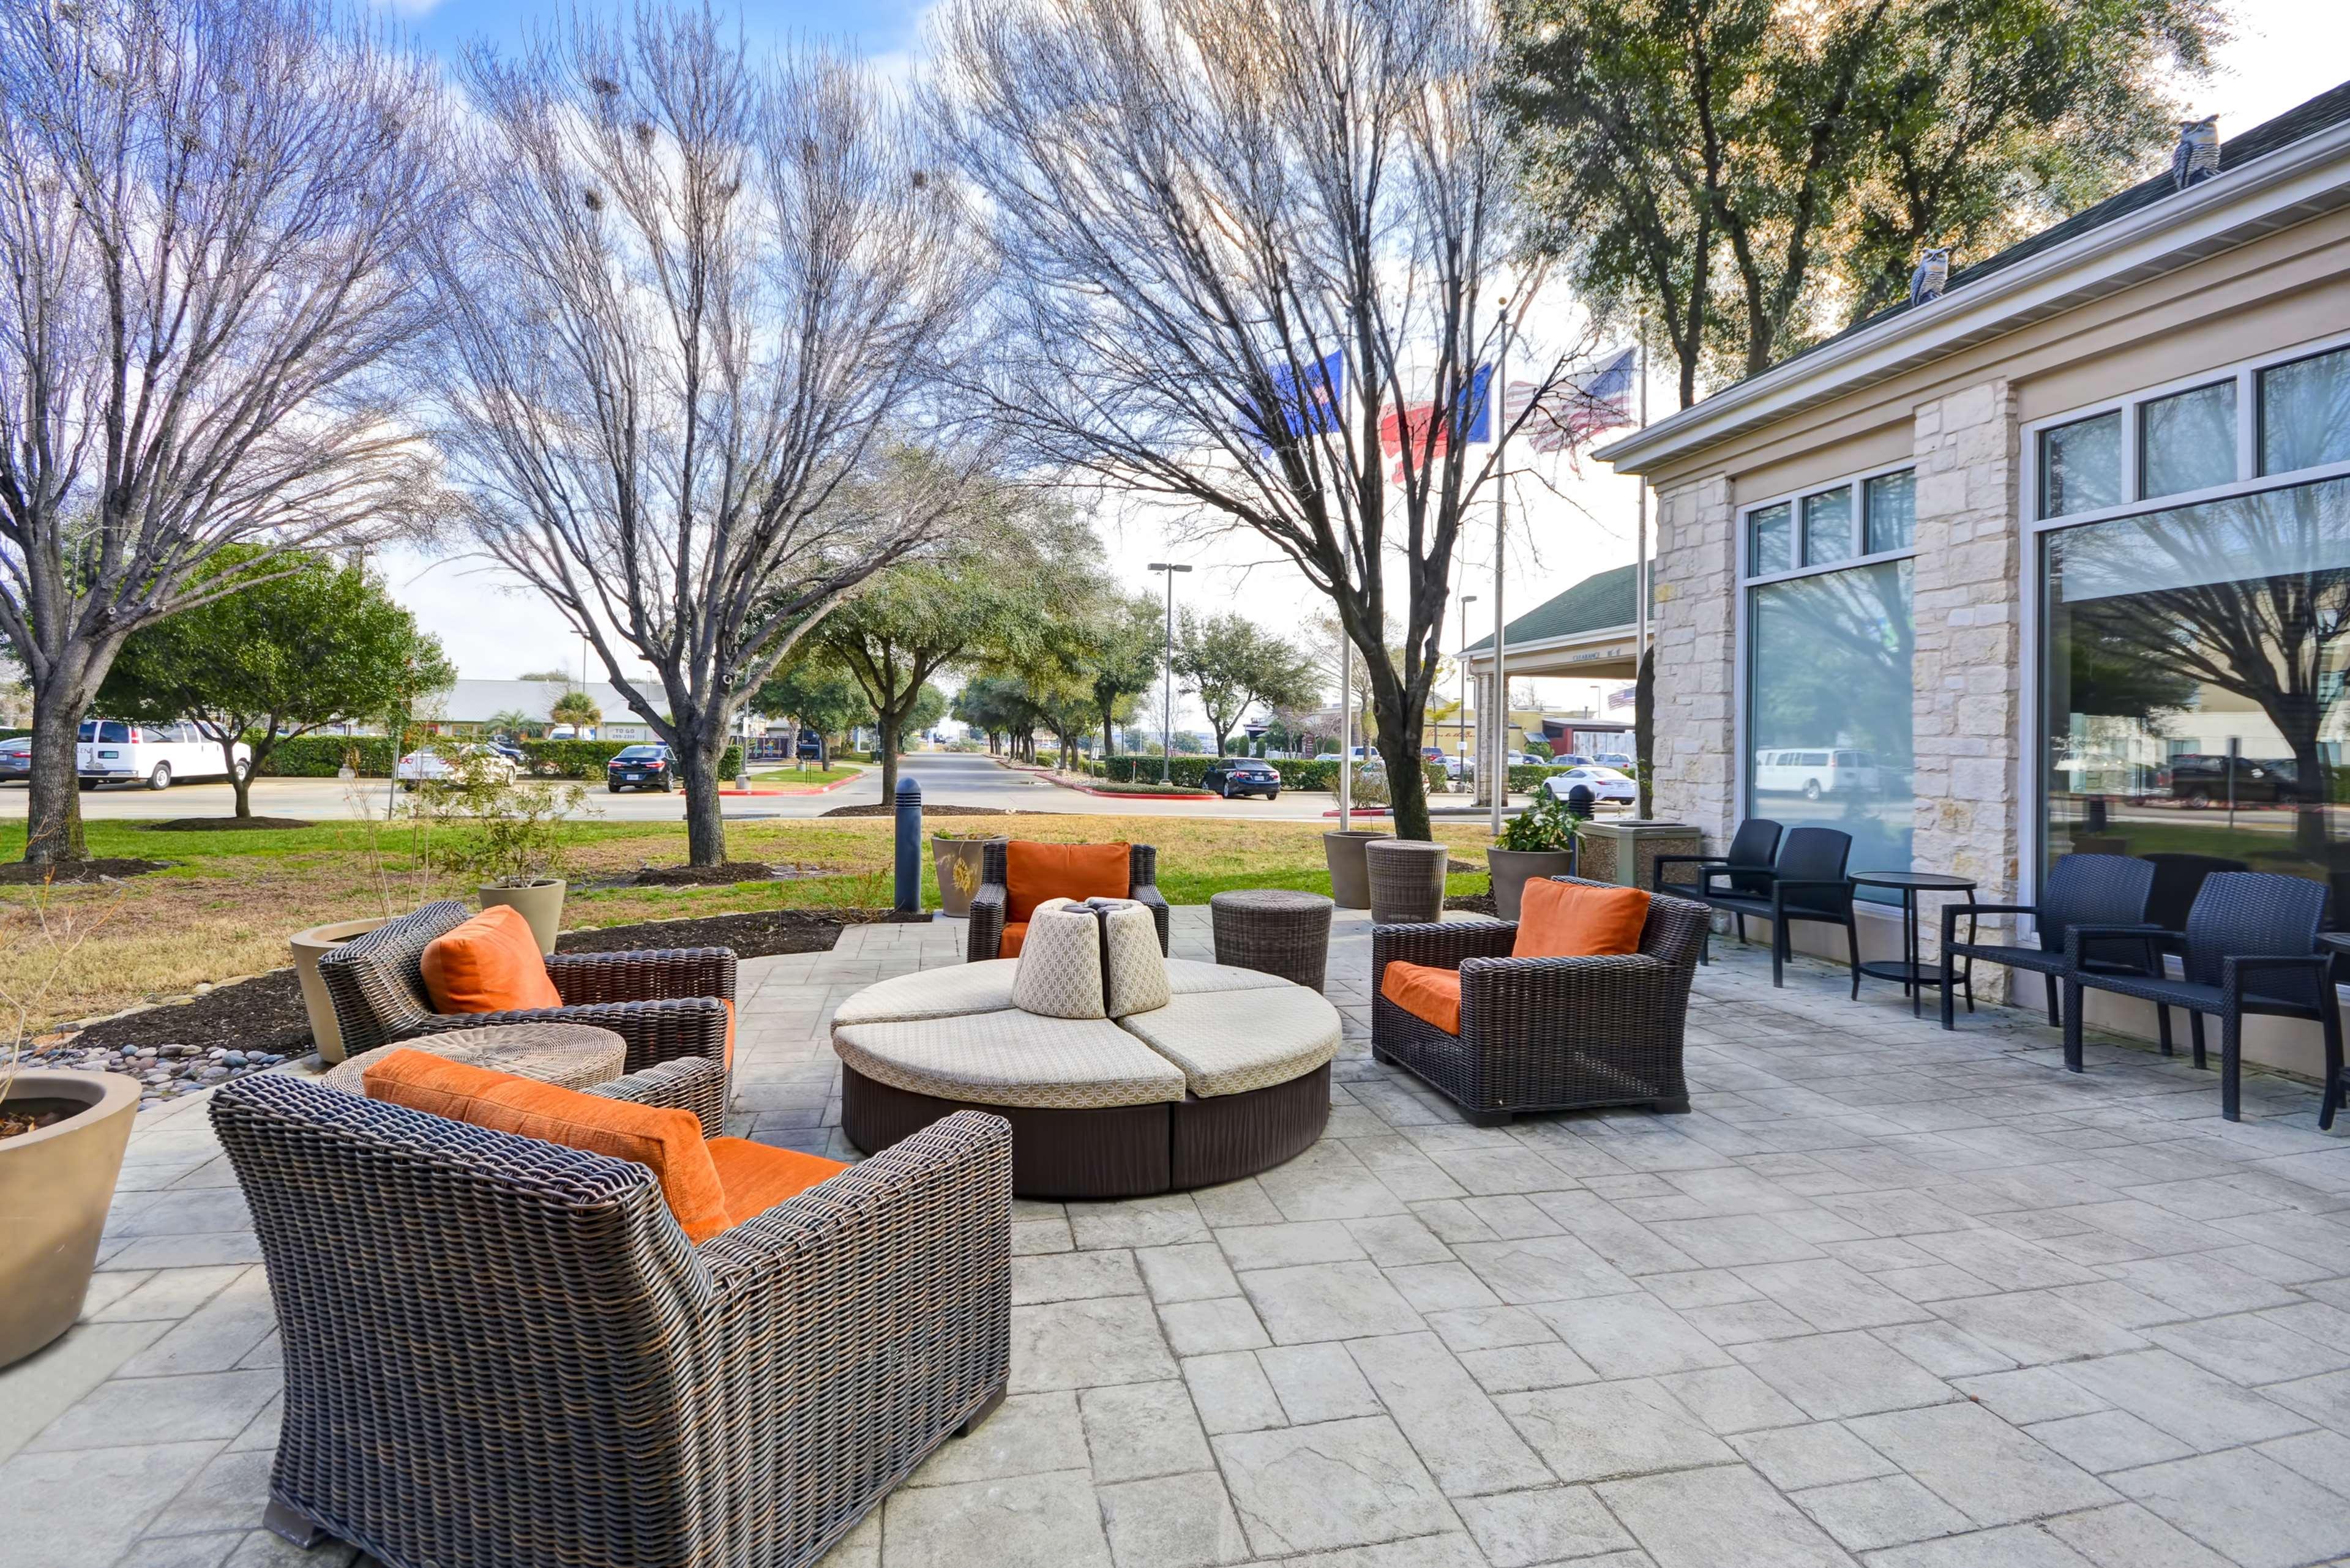 Hilton Garden Inn Austin/Round Rock image 33